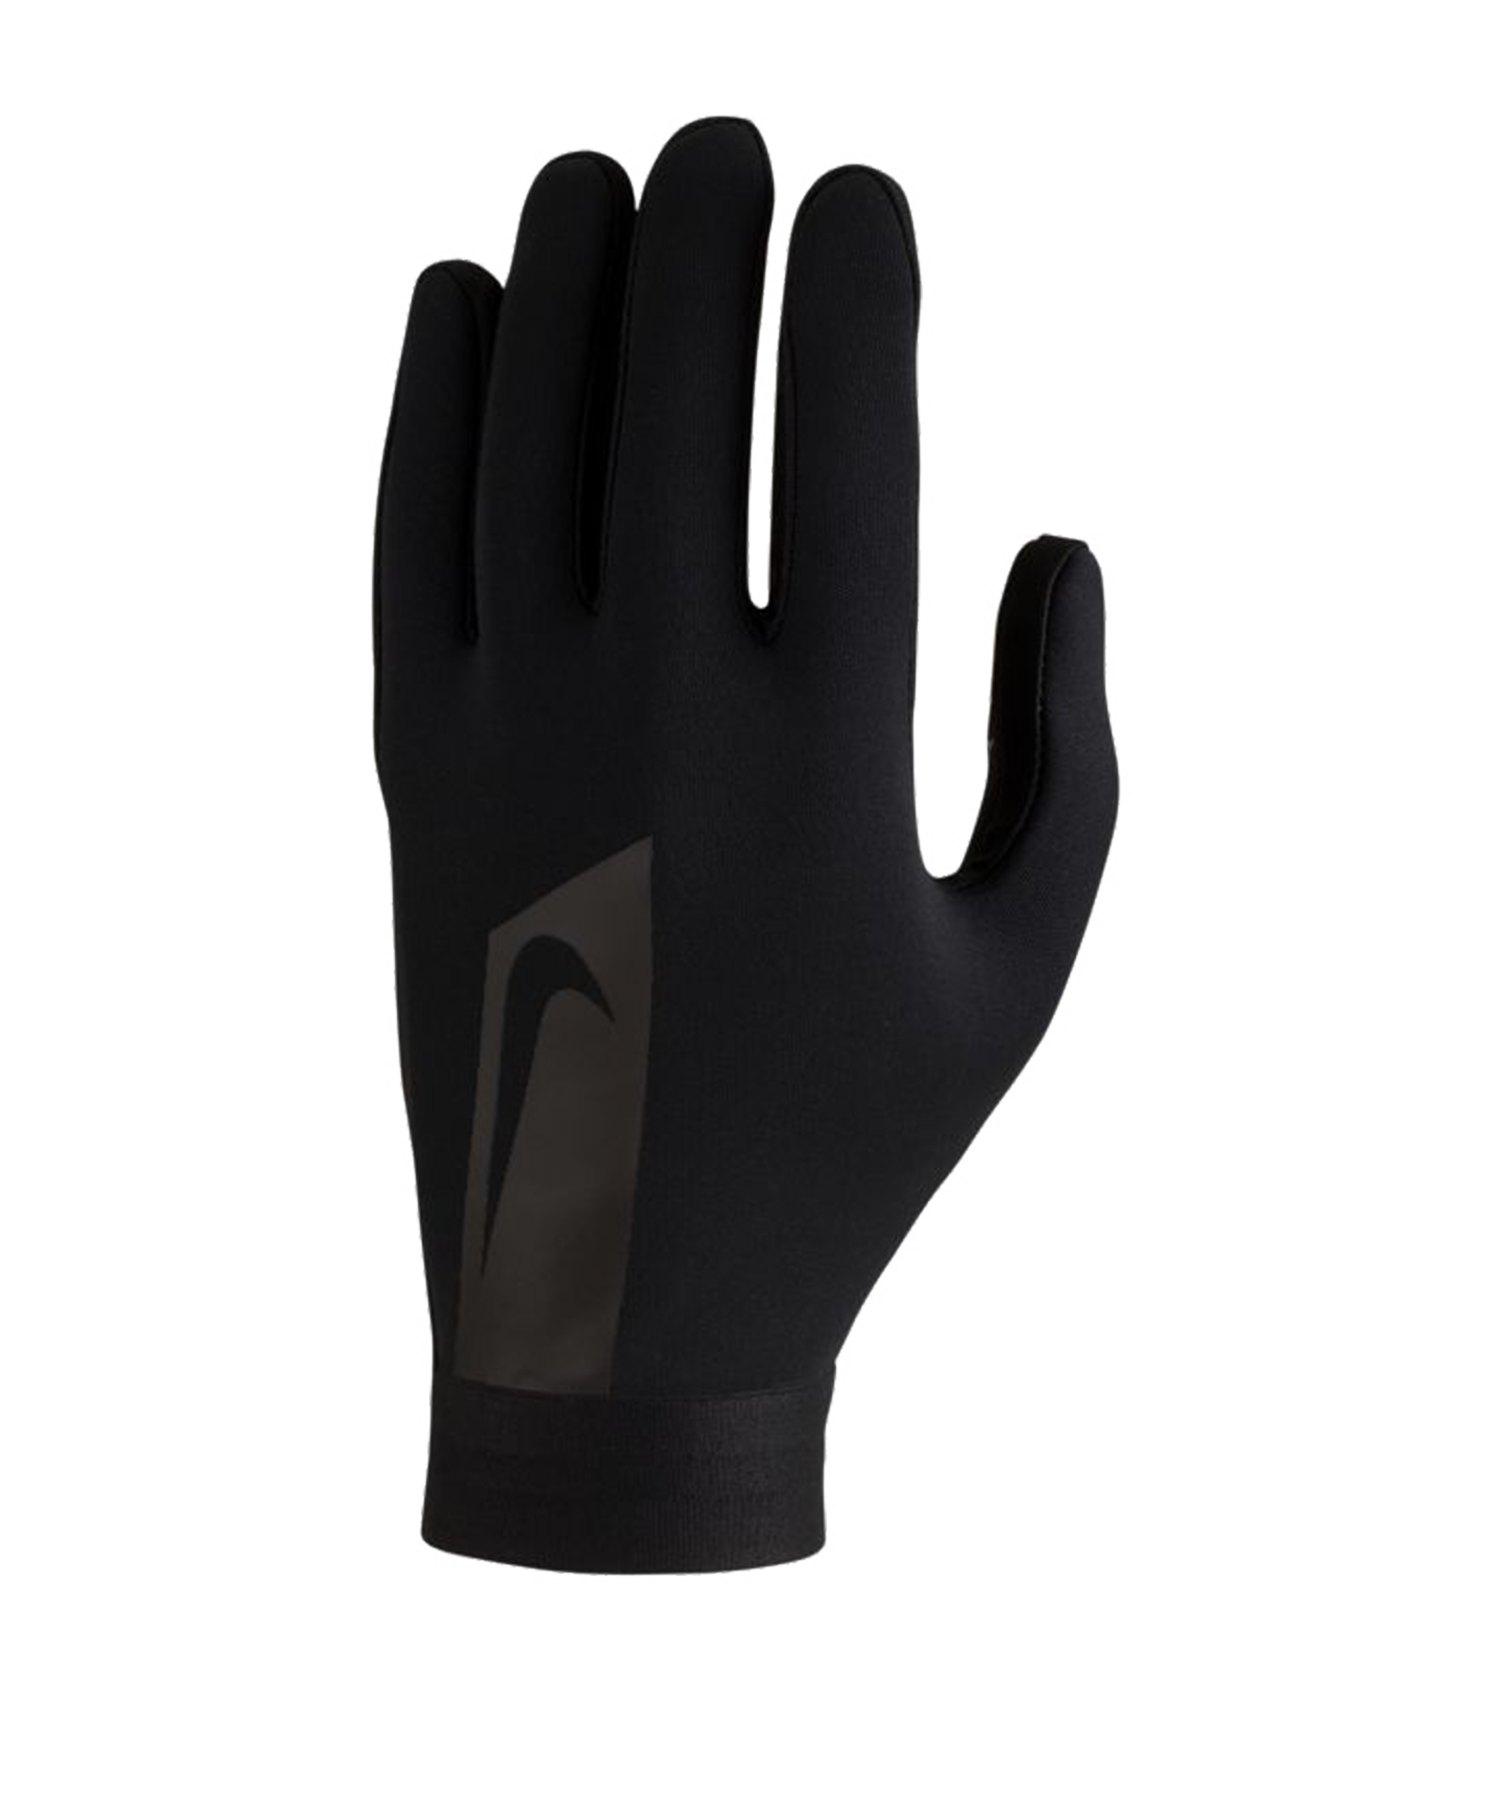 online retailer d5209 d738a Nike Hyperwarm Academy Feldspielerhandschuhe F011 - schwarz